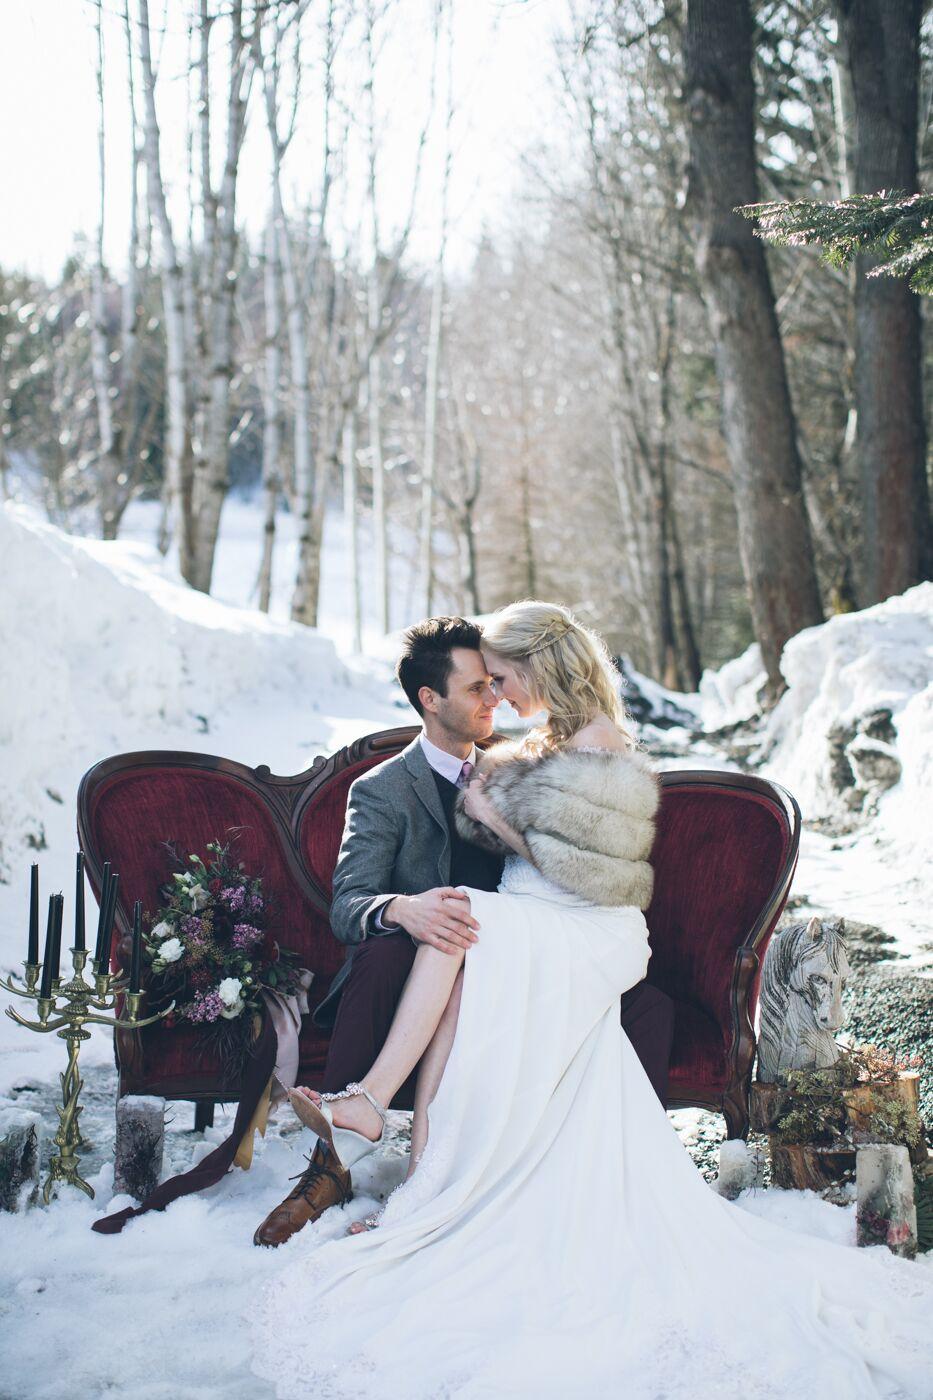 aniko-photography-mt-hood-bnb-wedding-72_preview.jpeg